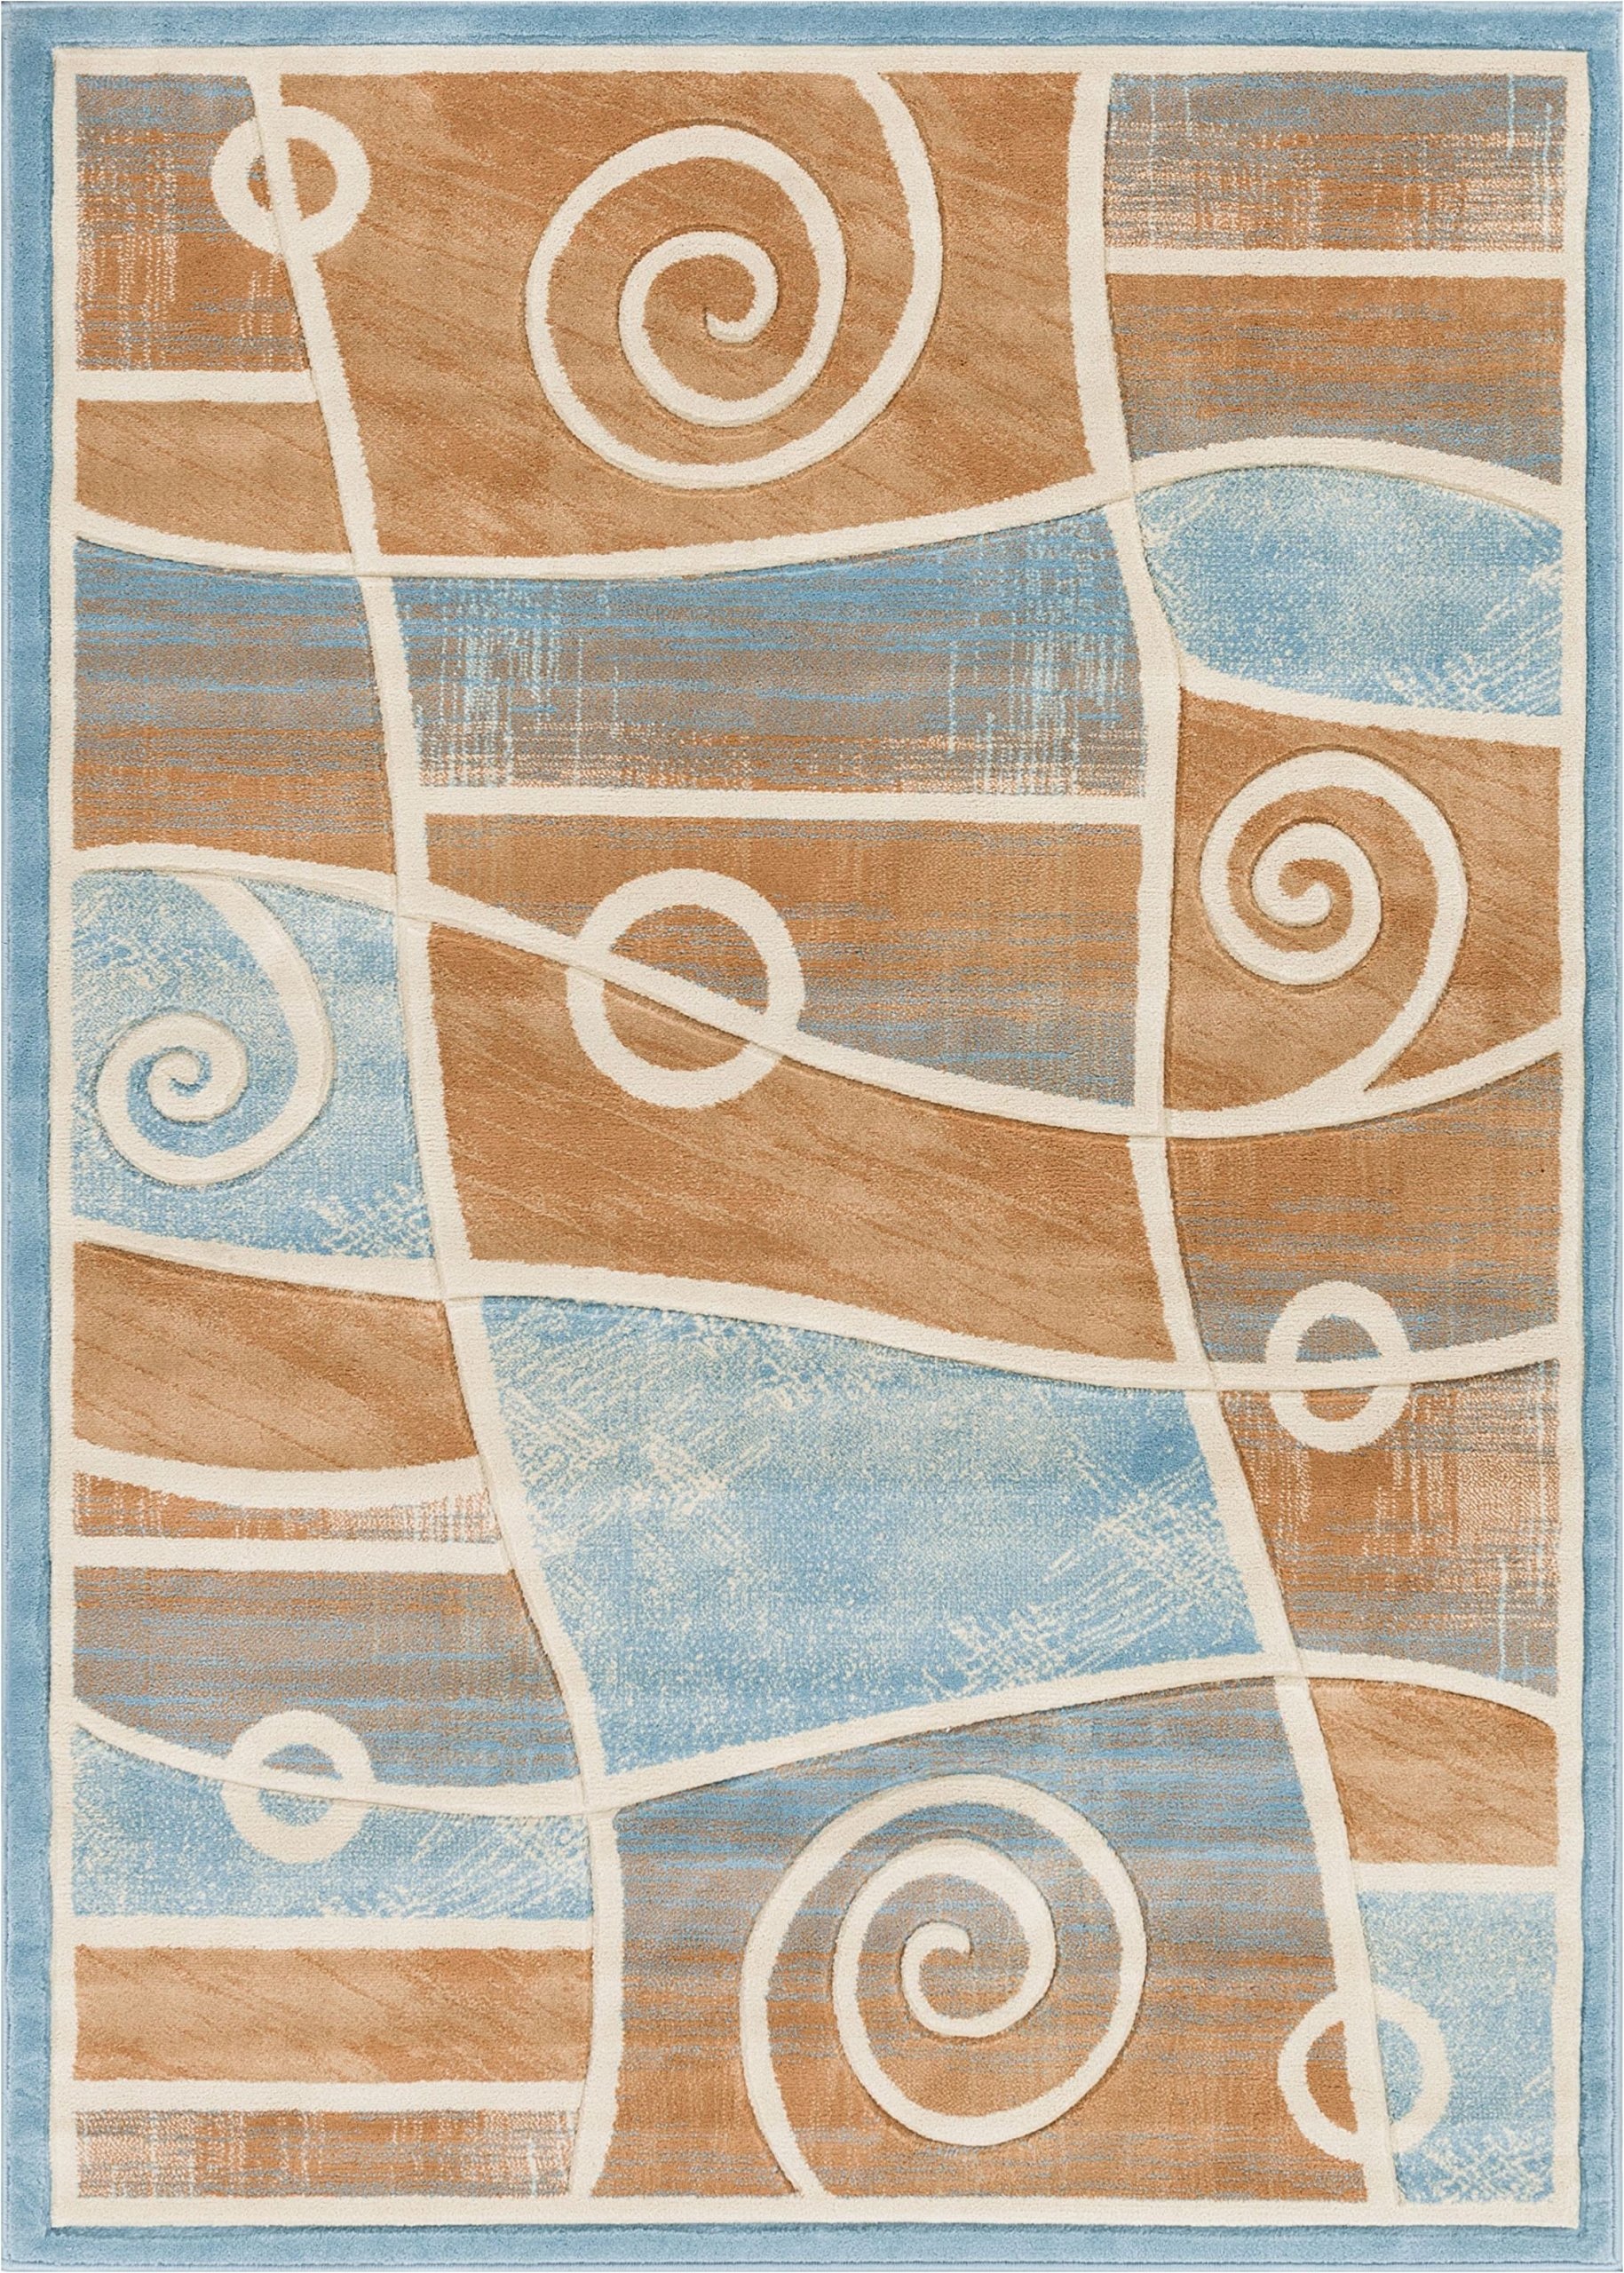 Well Woven BK-16-5 Bingo Dulcet Modern Area Rug, 5'3'' x 7'3'', Blue